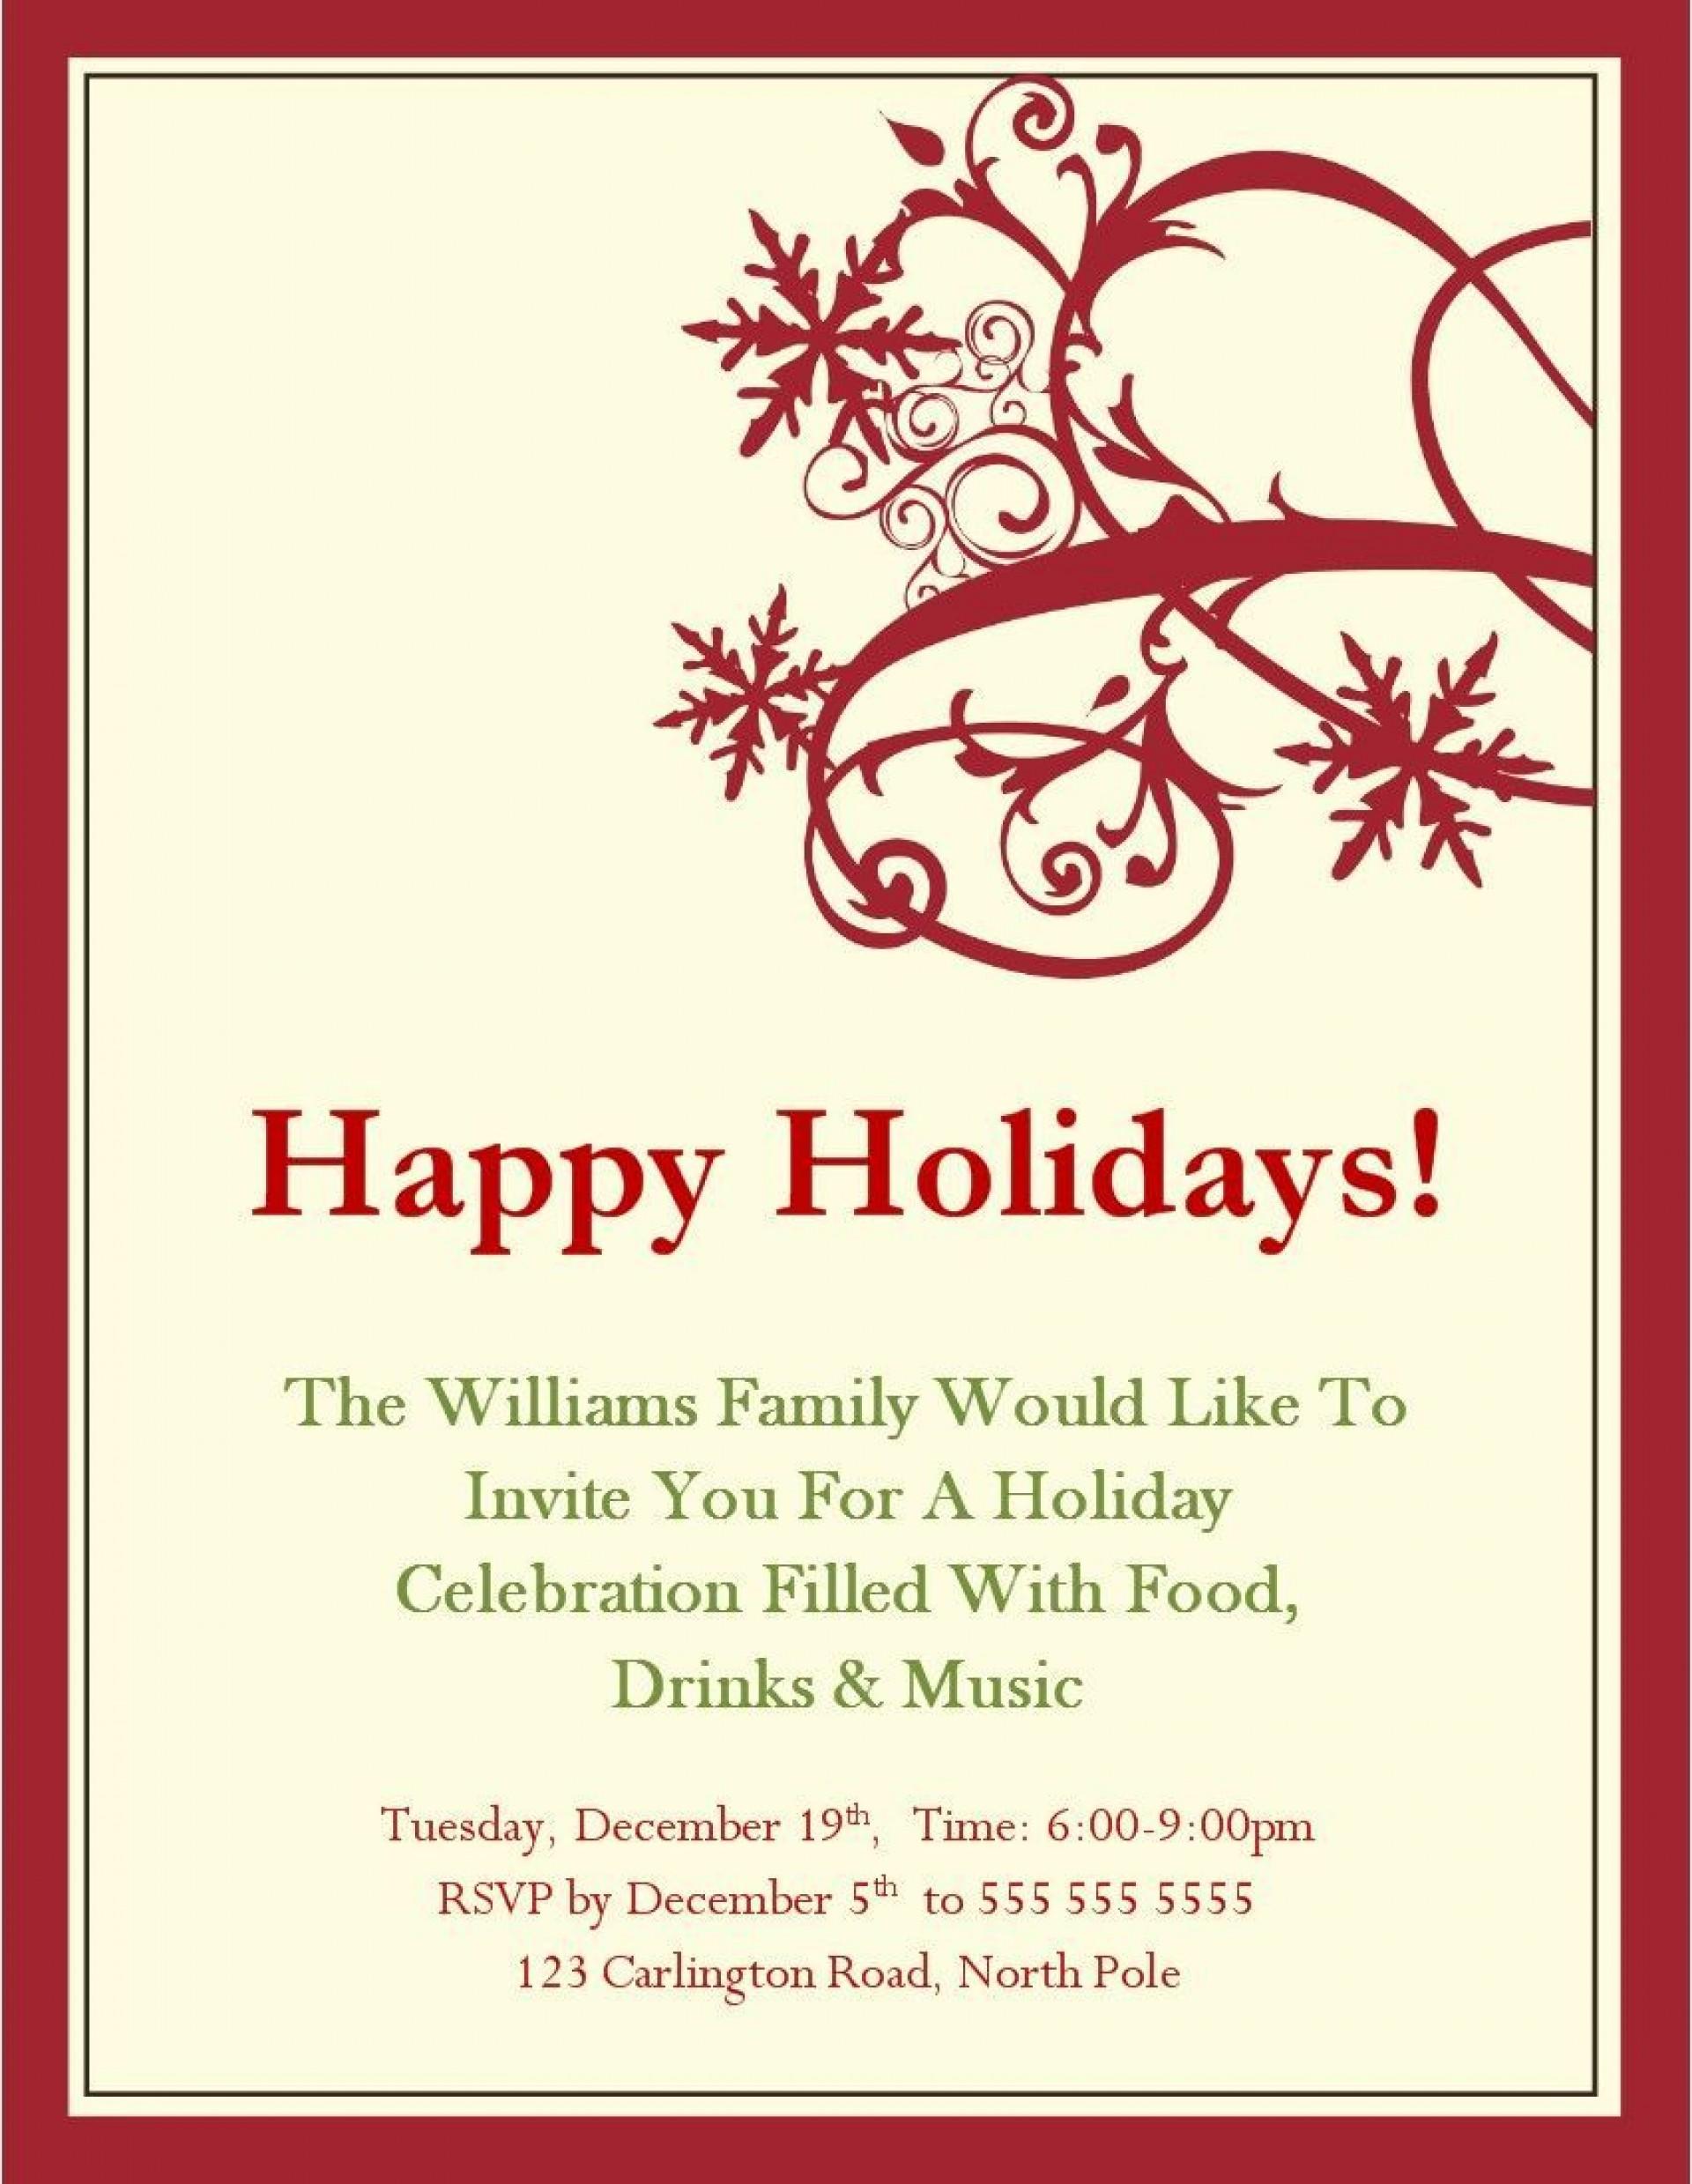 Christmas Party Invitation Templates Addictionary